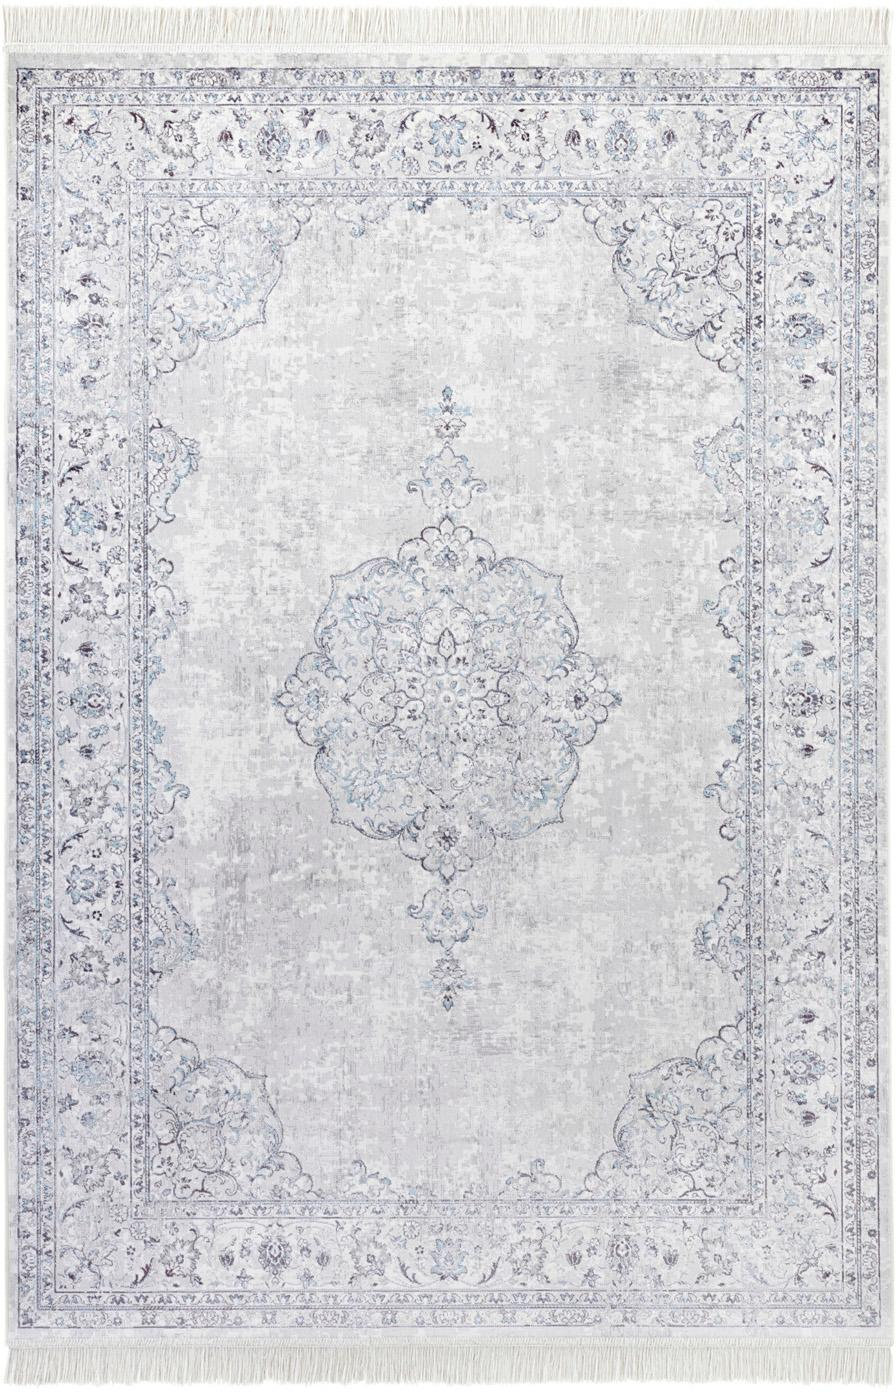 Teppich Medaillon im Vintage Look, 60% Viskose; 40% Baumwolle, Pastellblau, Hellgrau, B 95 x L 140 cm (Größe XS)